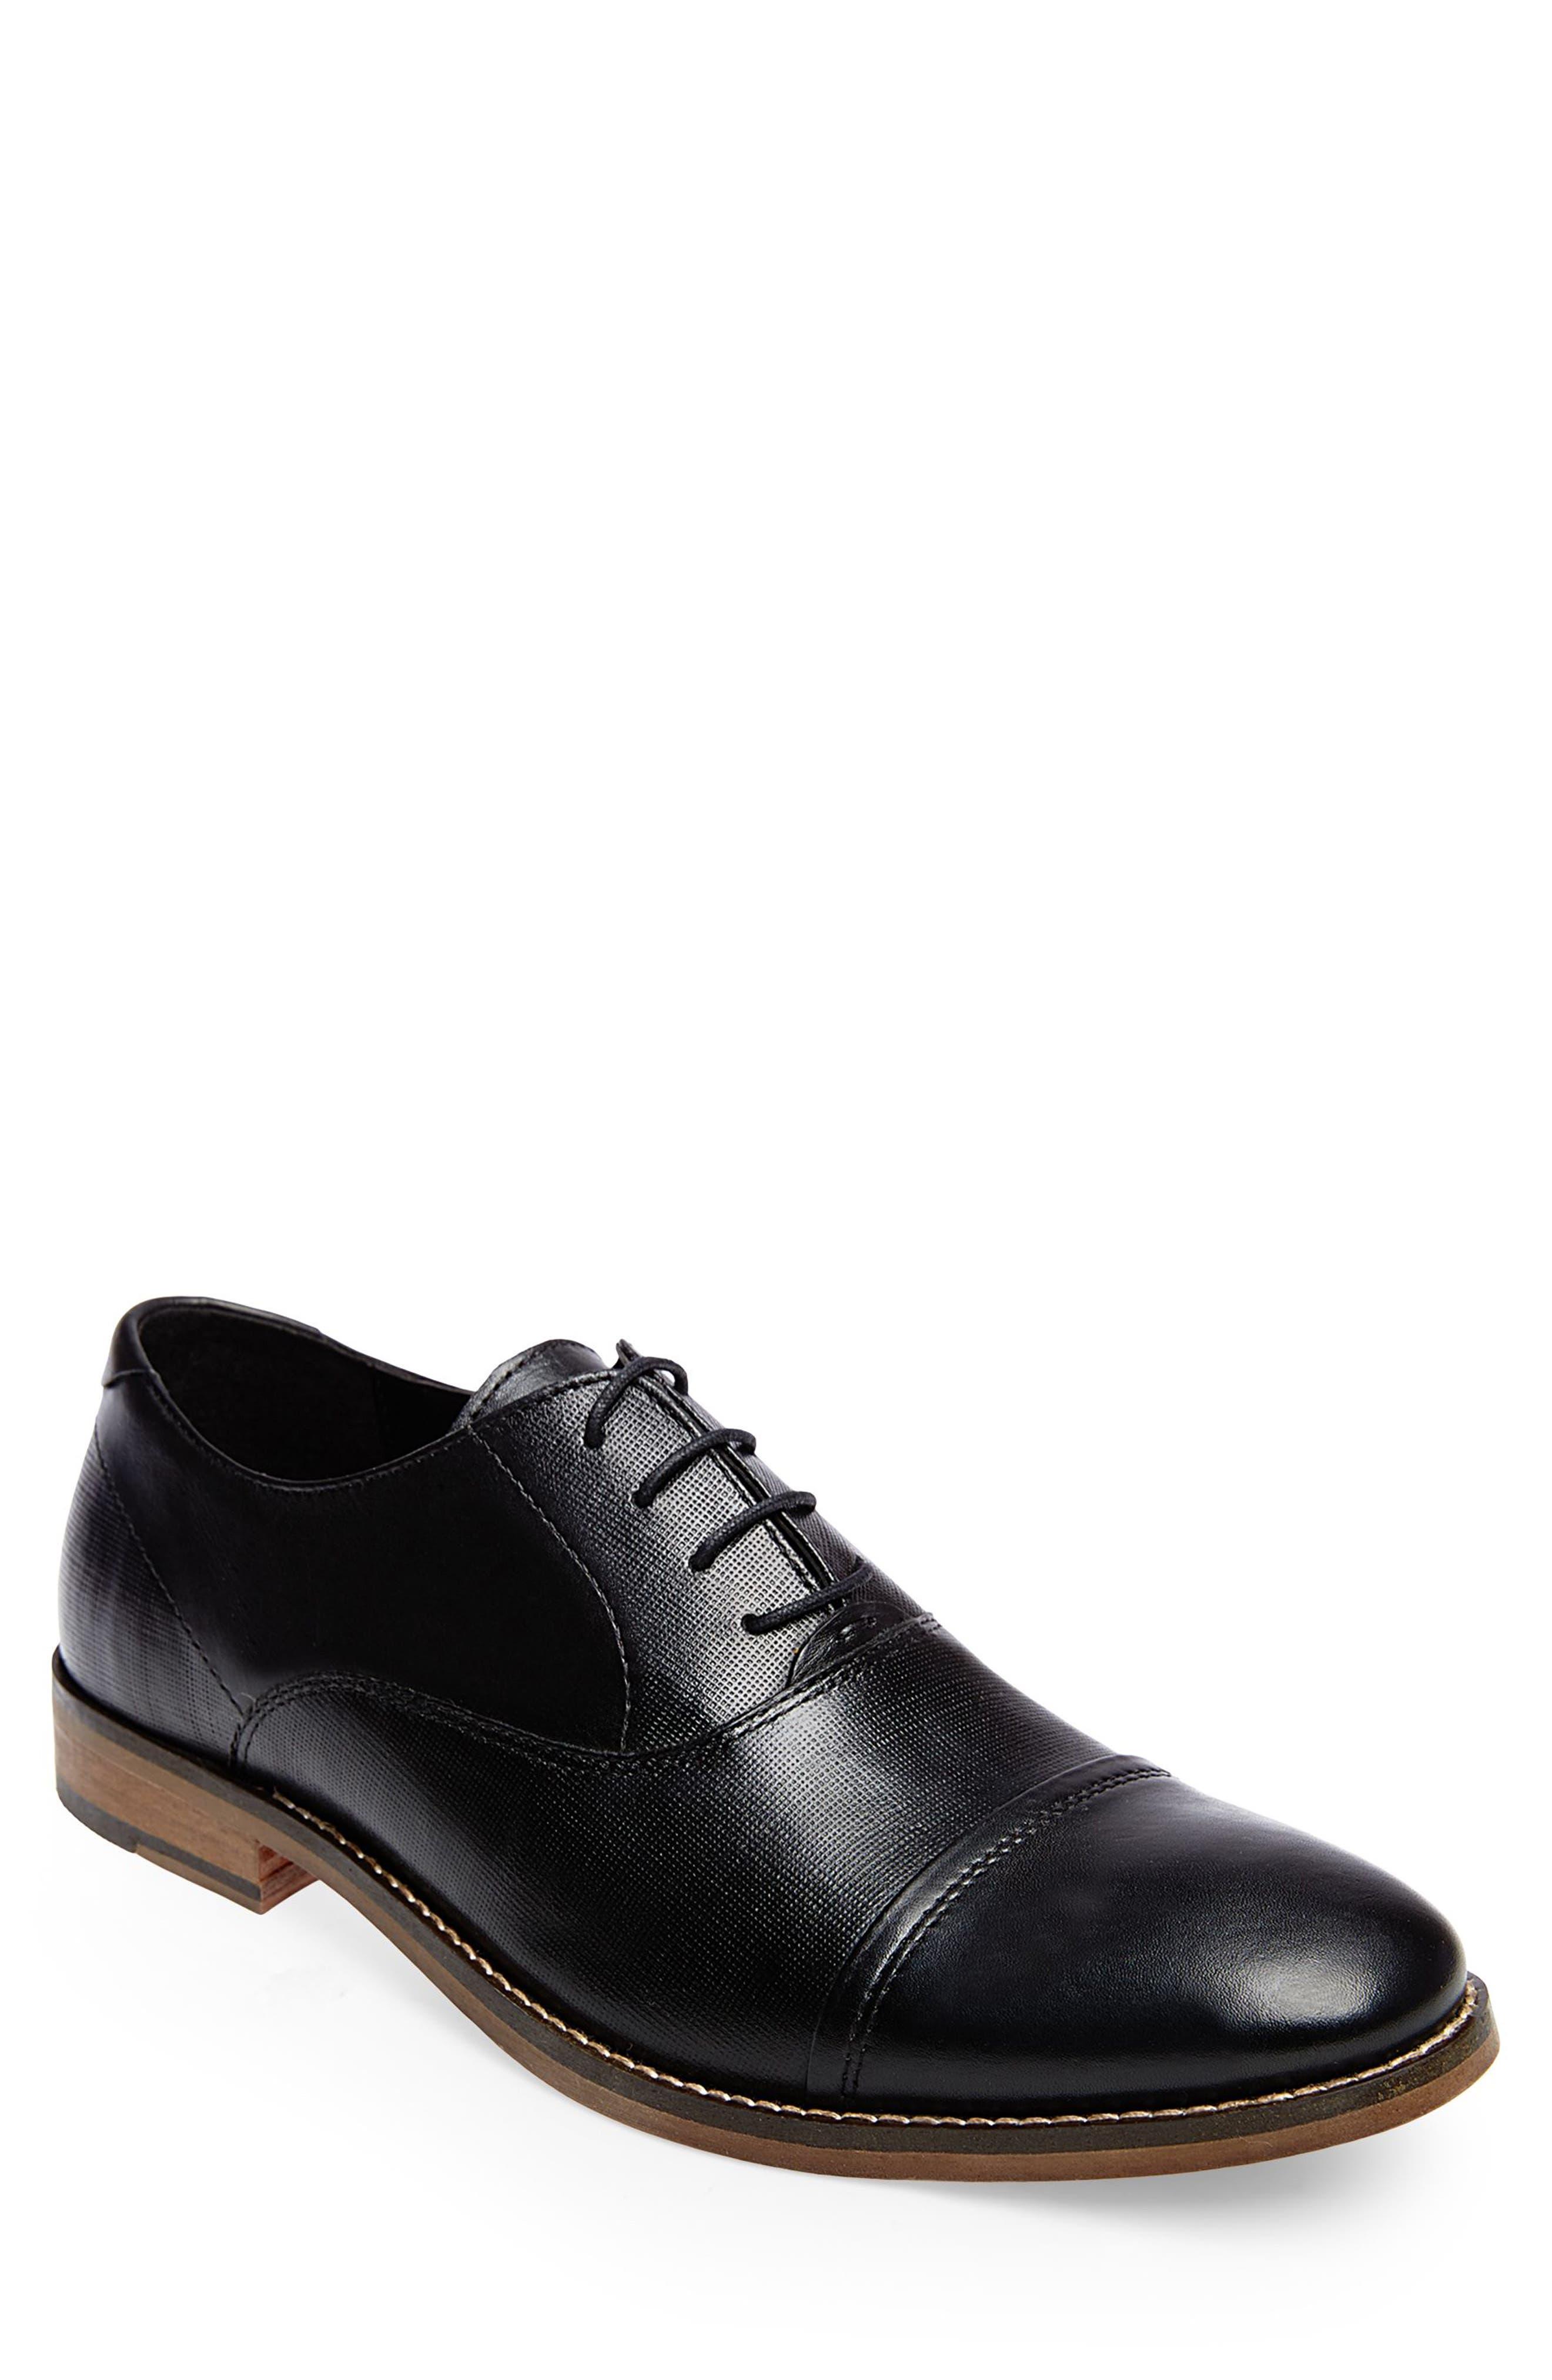 STEVE MADDEN, Finnich Textured Cap Toe Oxford, Main thumbnail 1, color, BLACK